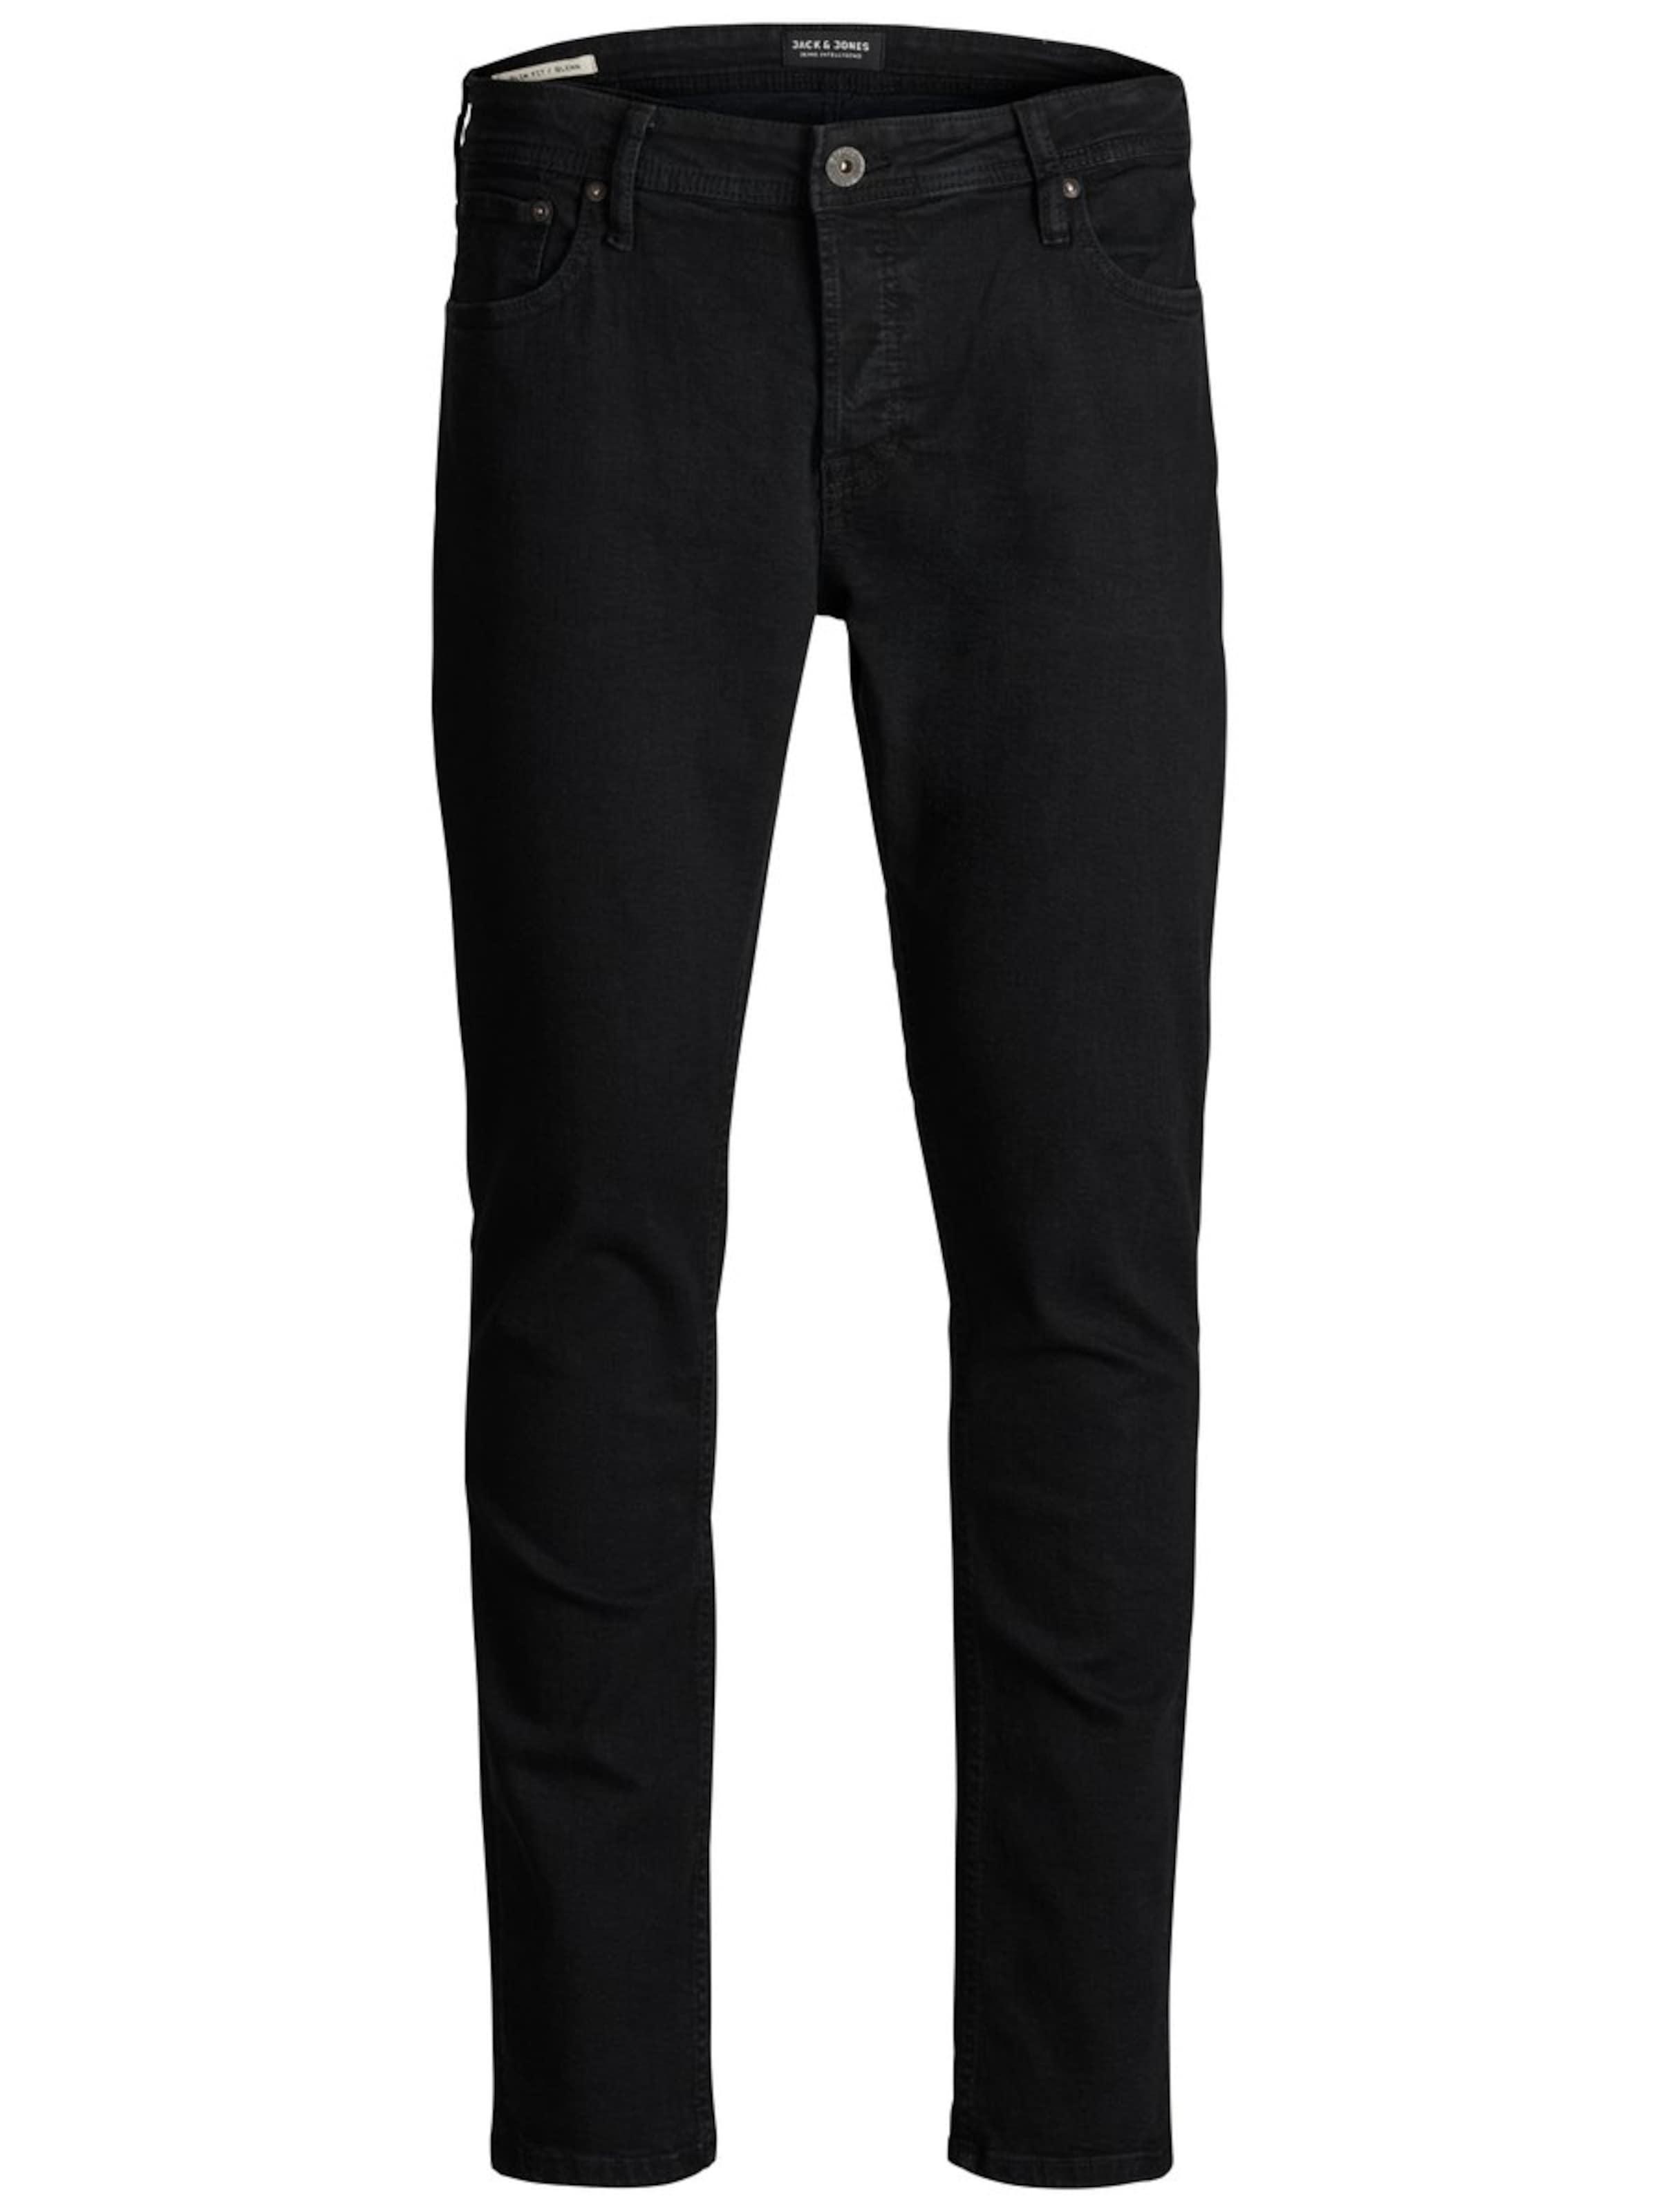 In Jackamp; Schwarz 'glenn Jones Jeans Original' DE29eWIYH